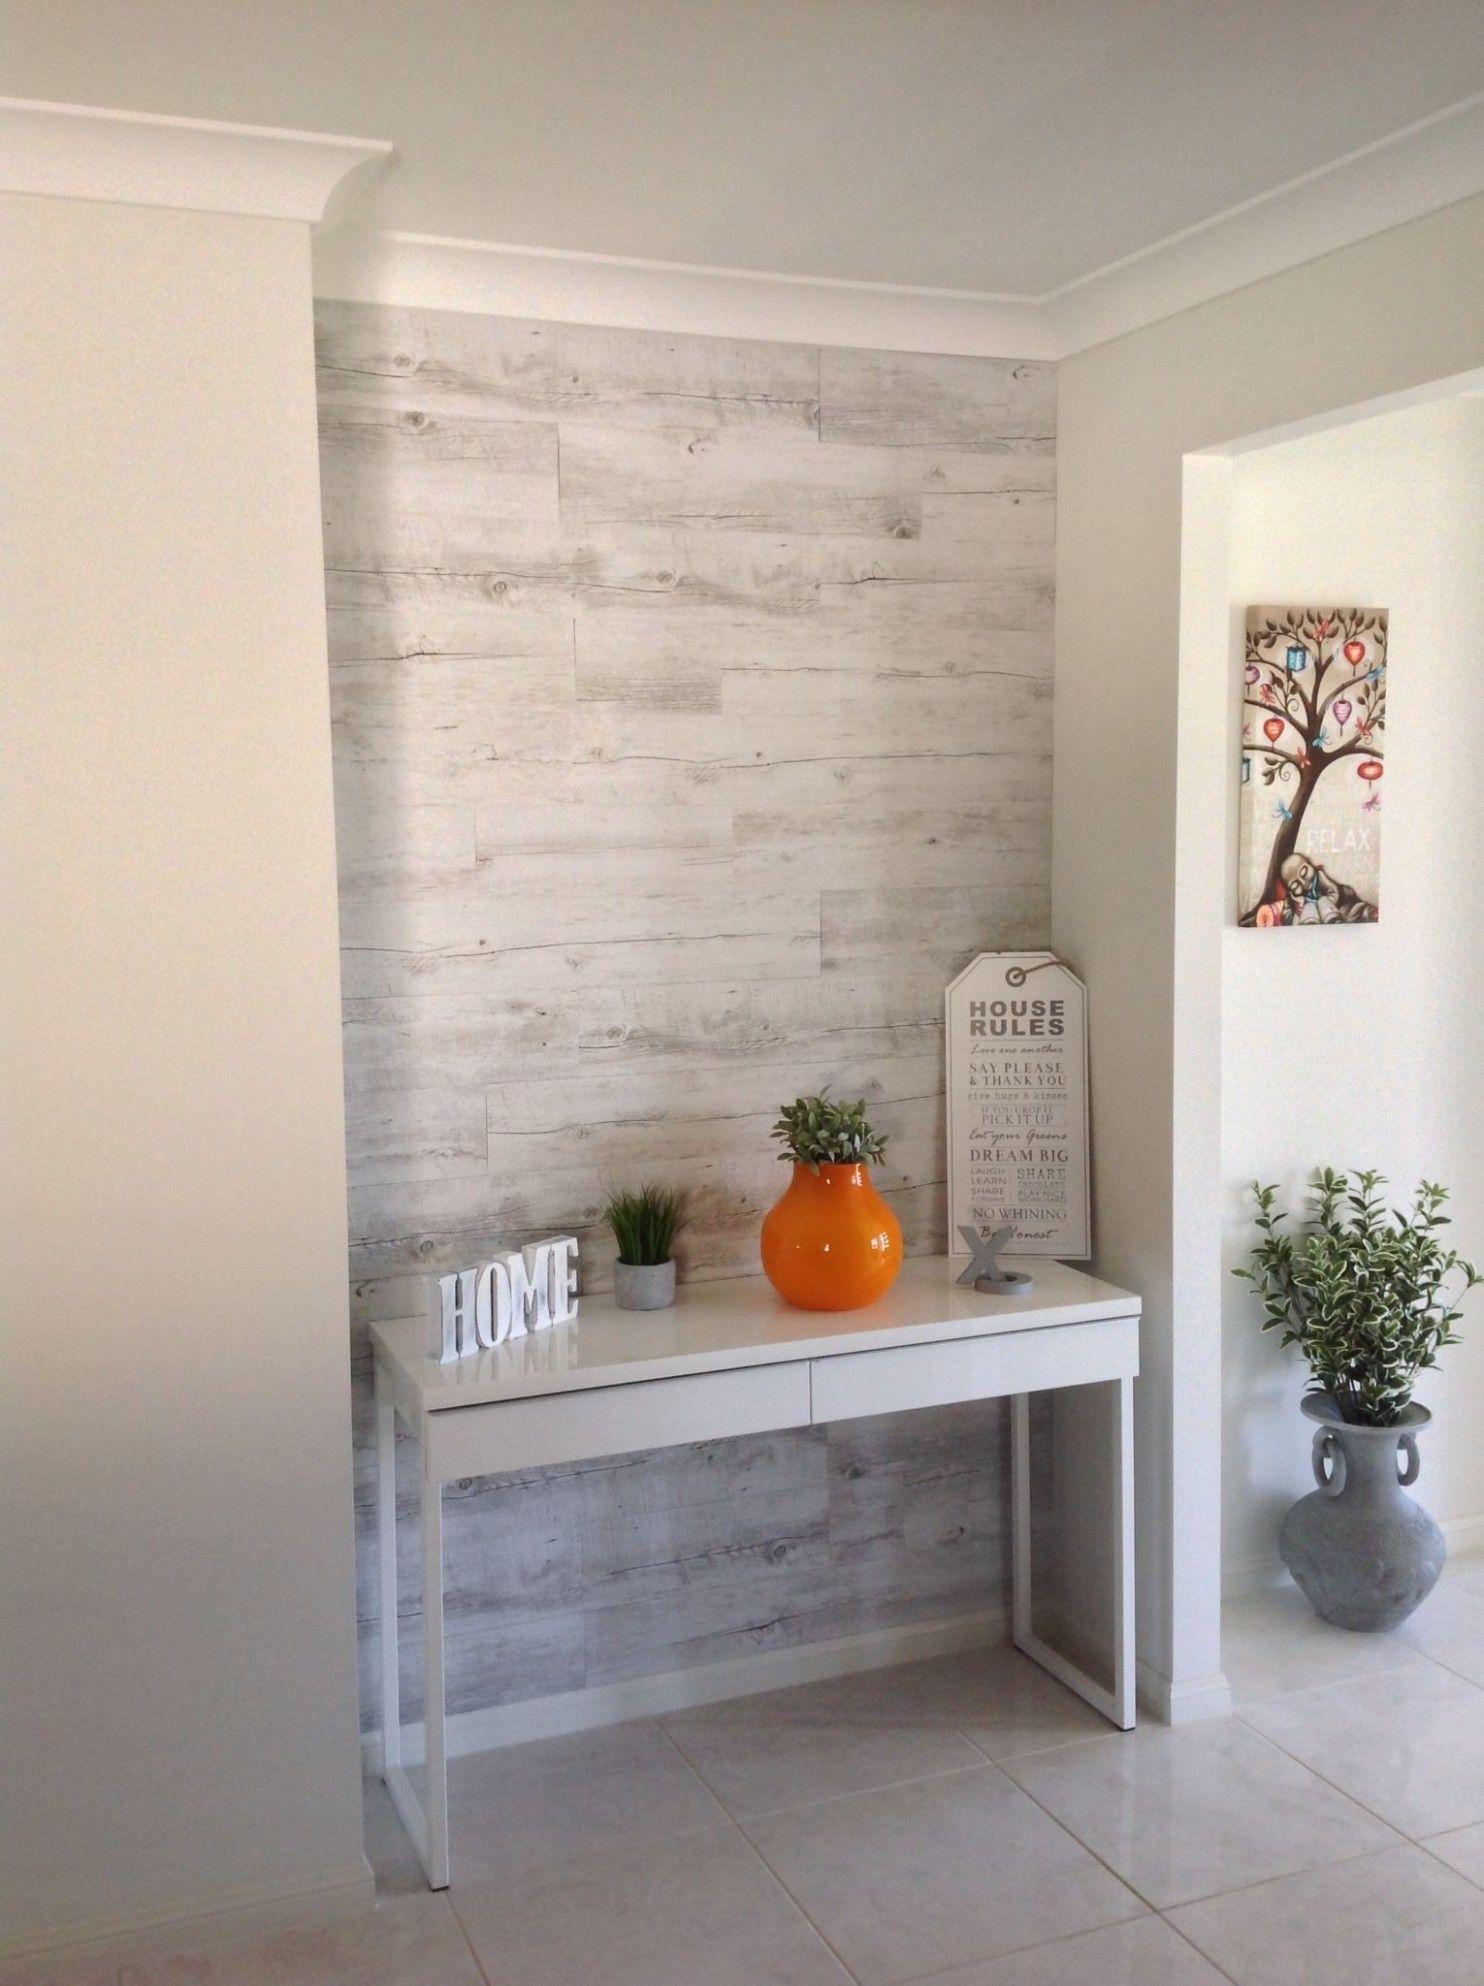 Vinyl Floor Tiles On Bathroom Wall In 2020 Vinyl Flooring Kitchen Flooring On Walls Kitchen Vinyl